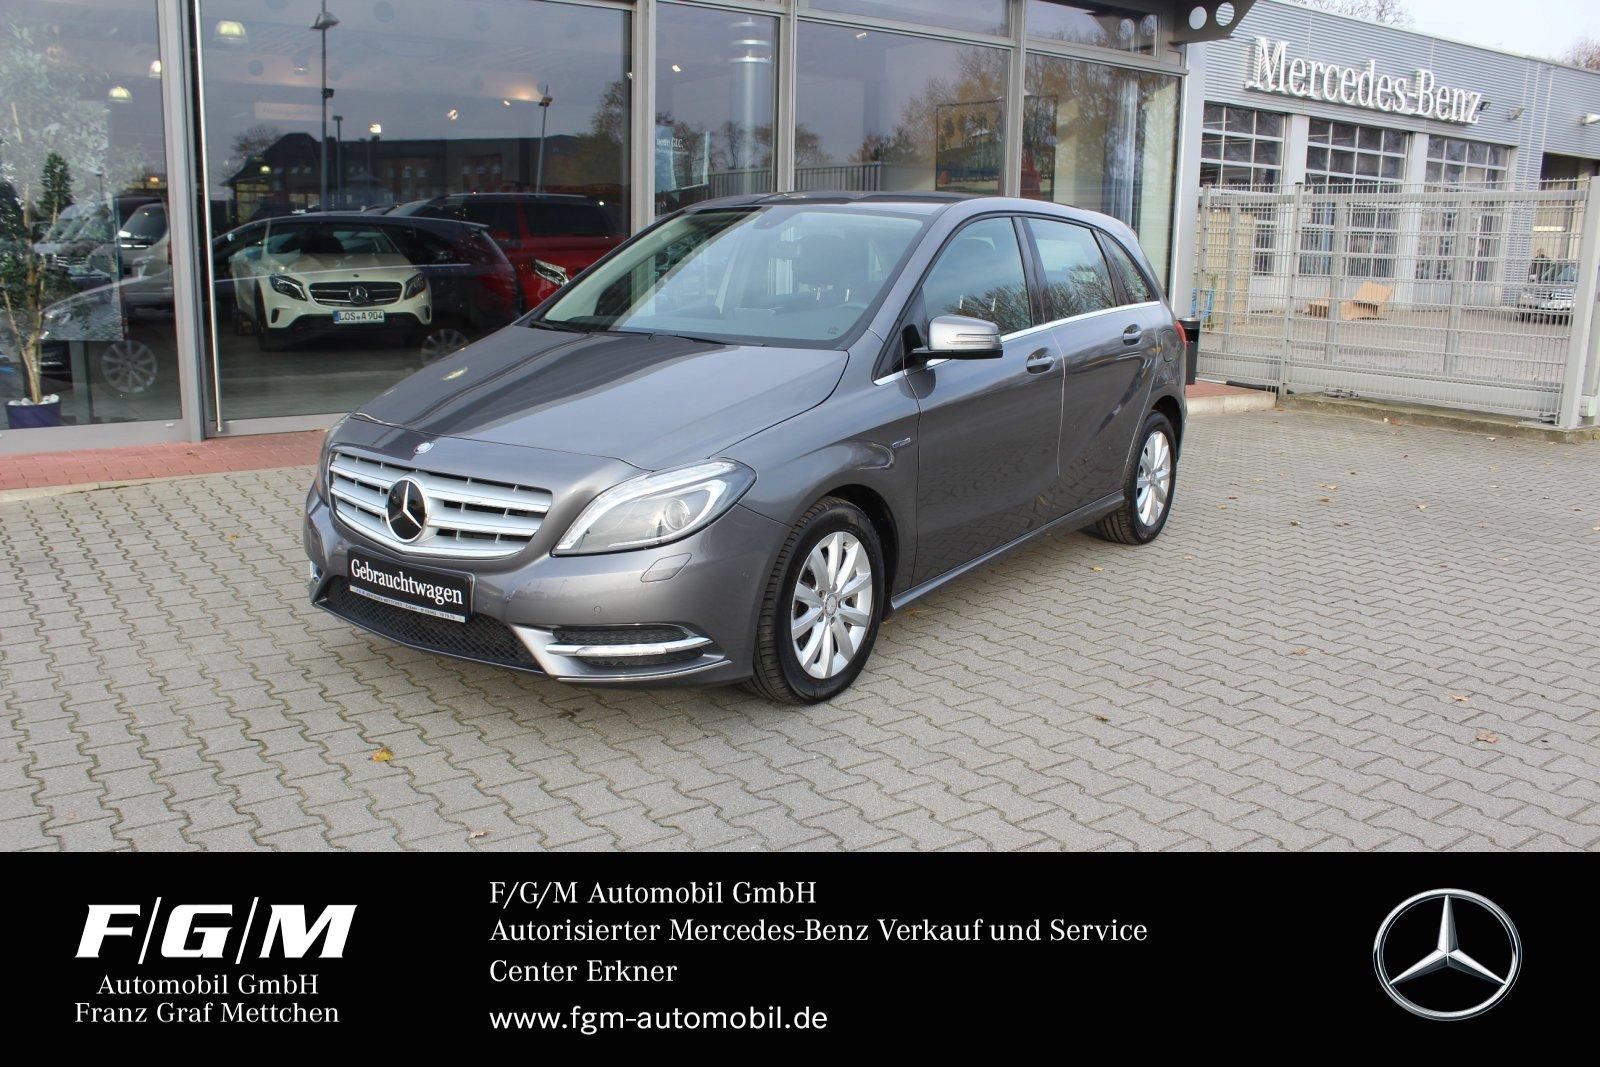 Mercedes-Benz B 200 CDI Klima/Xenon/AHK Park-Assist./P-Lenkung, Jahr 2012, diesel